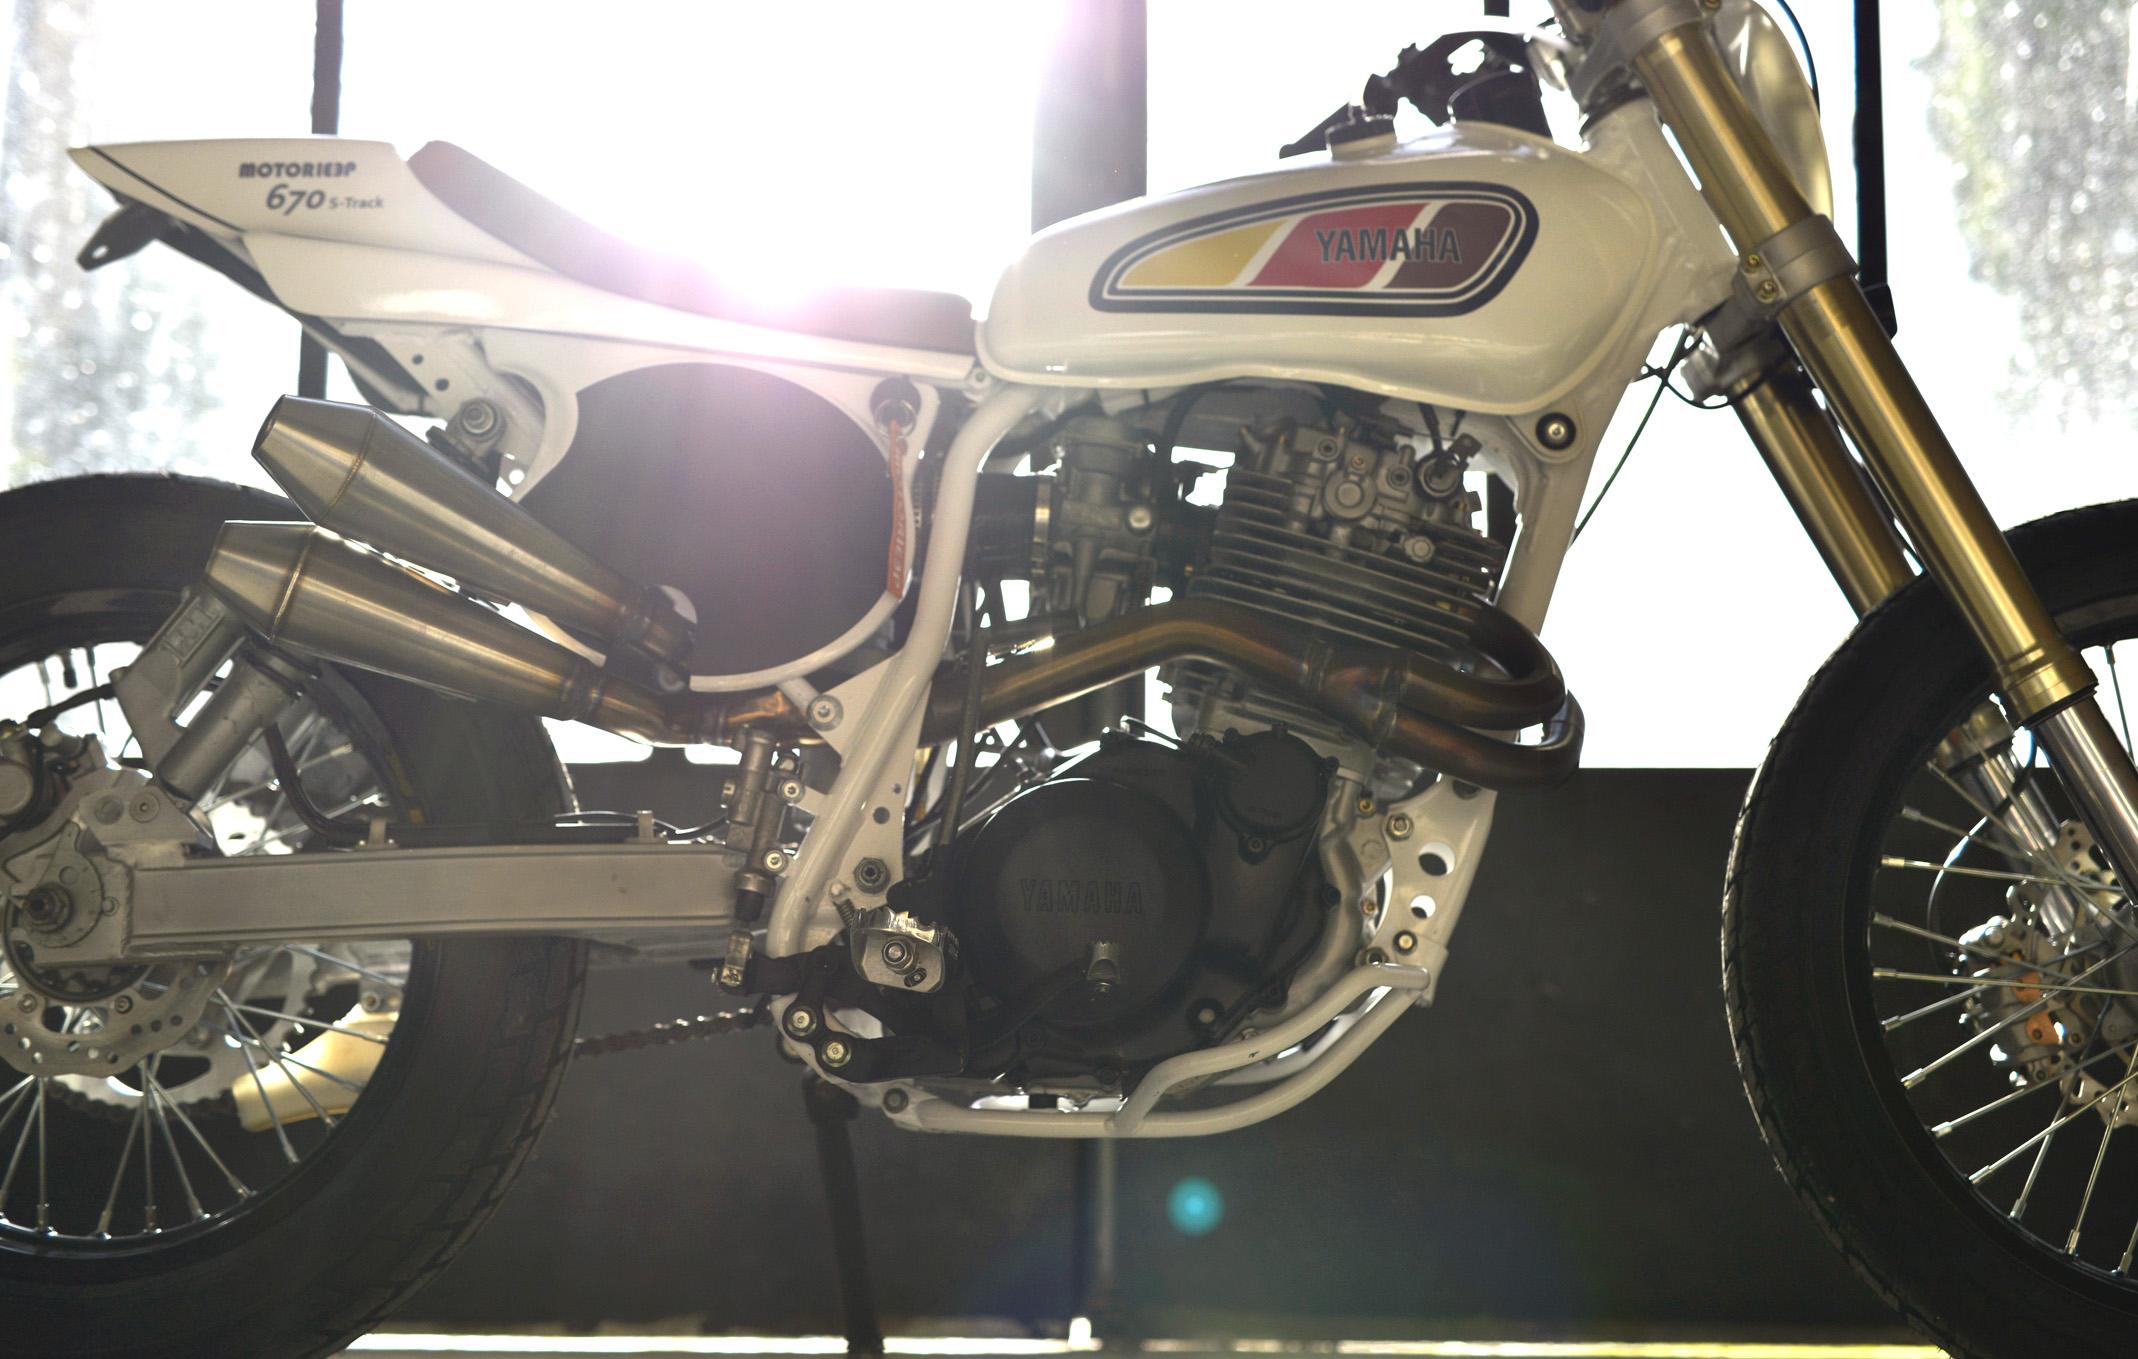 Motorieep 670 s-track 05